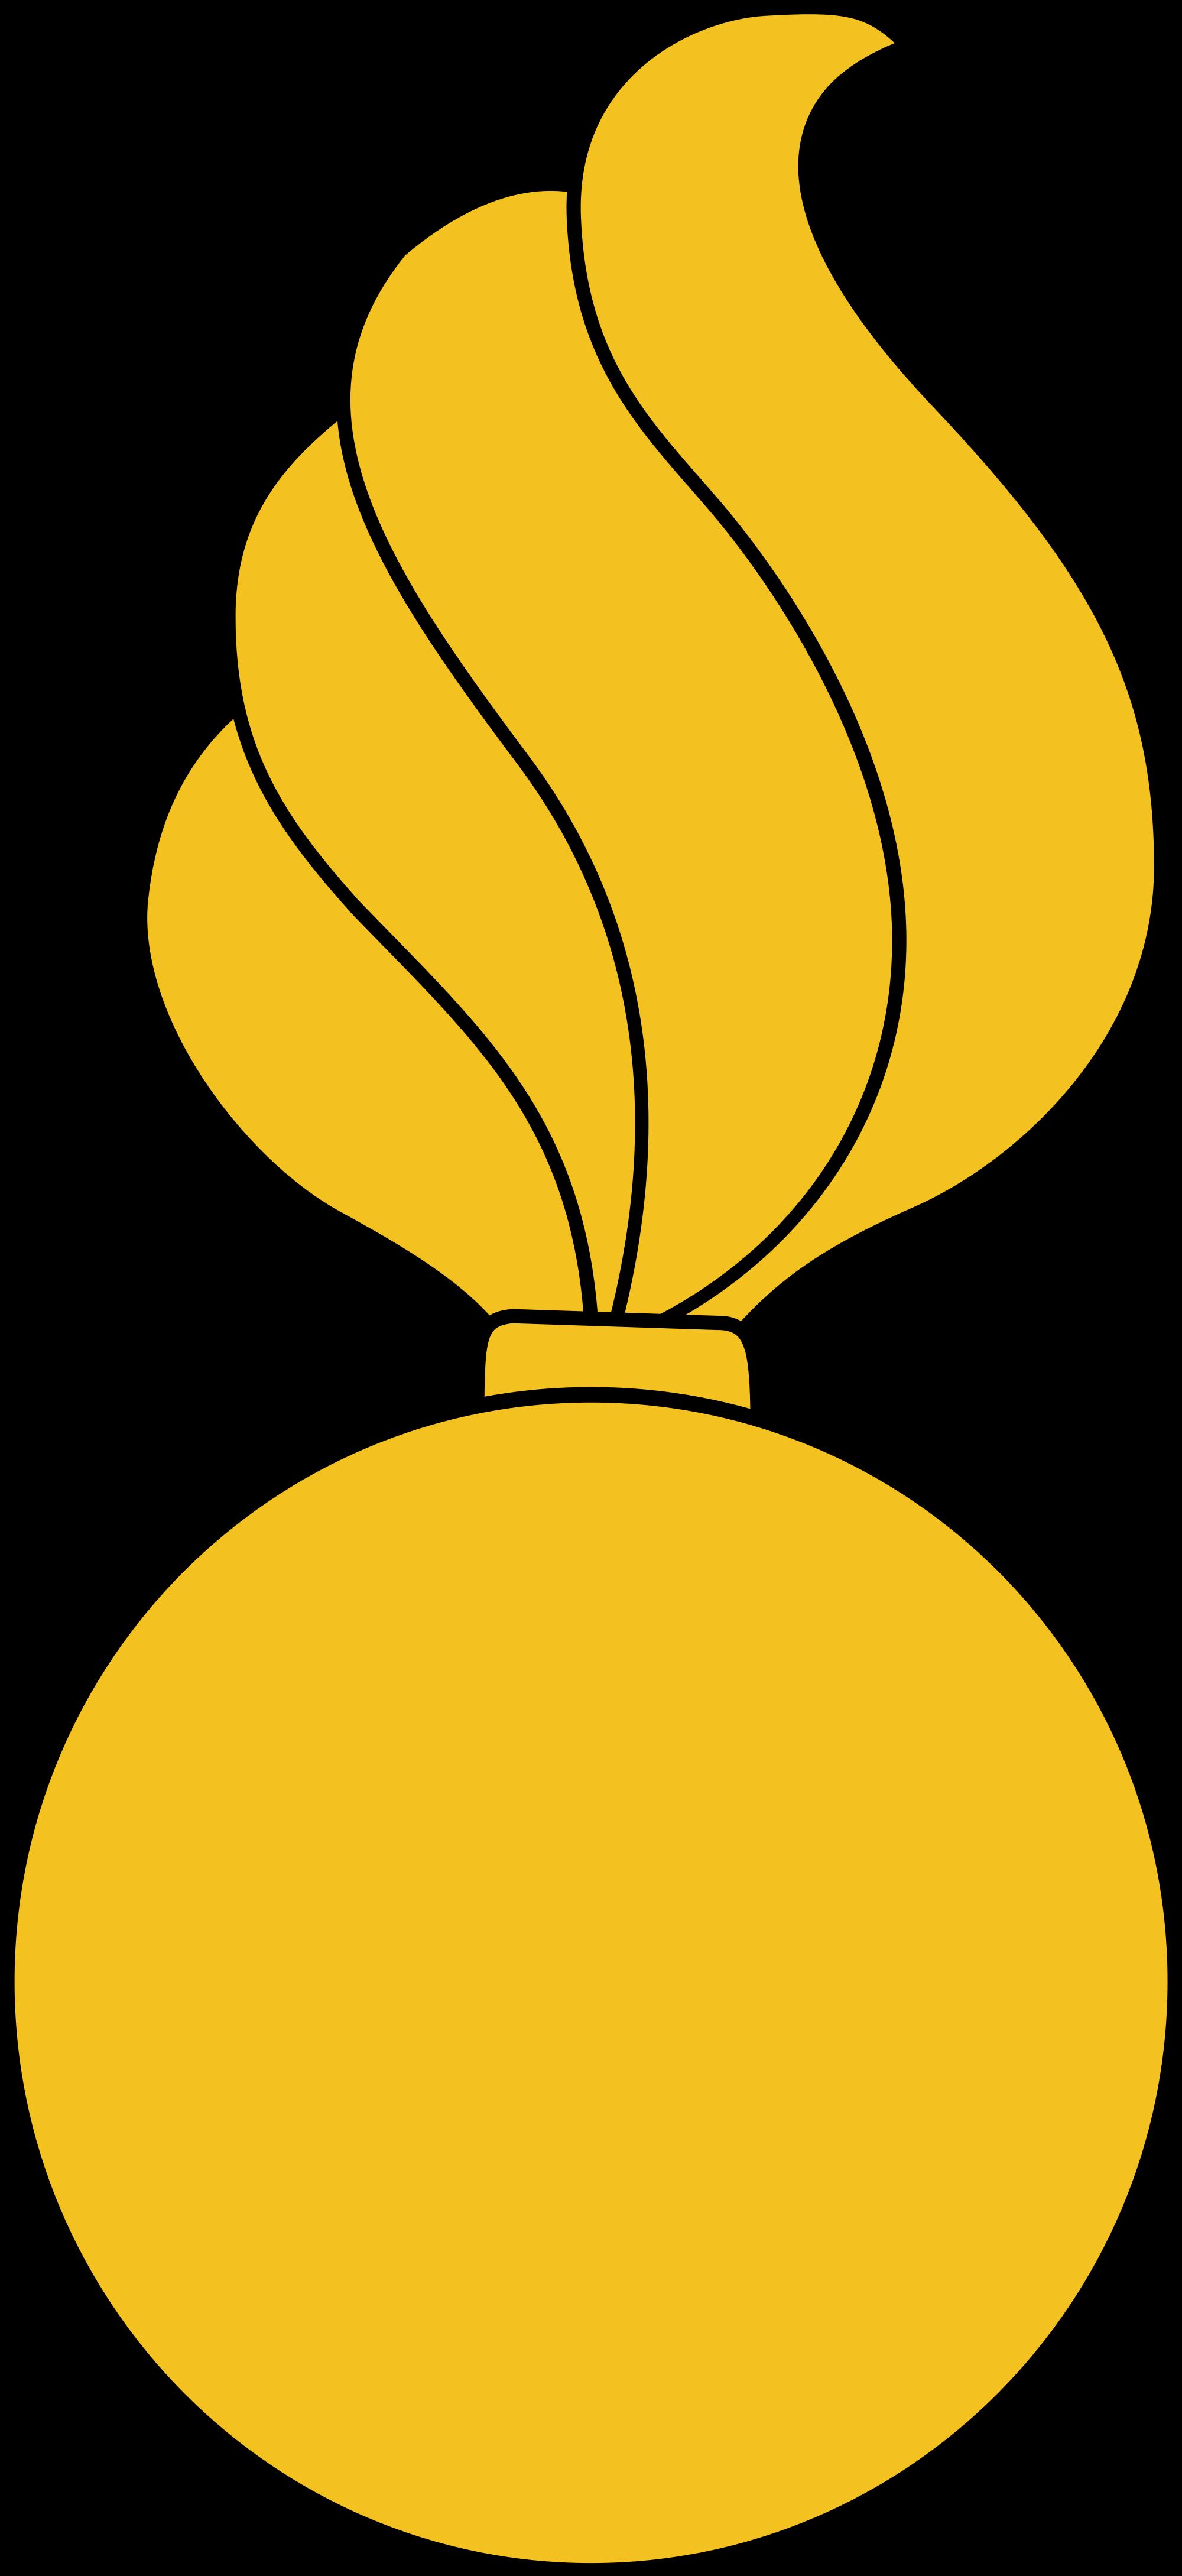 Free Ordnance Bomb Cliparts, Download Free Clip Art, Free.